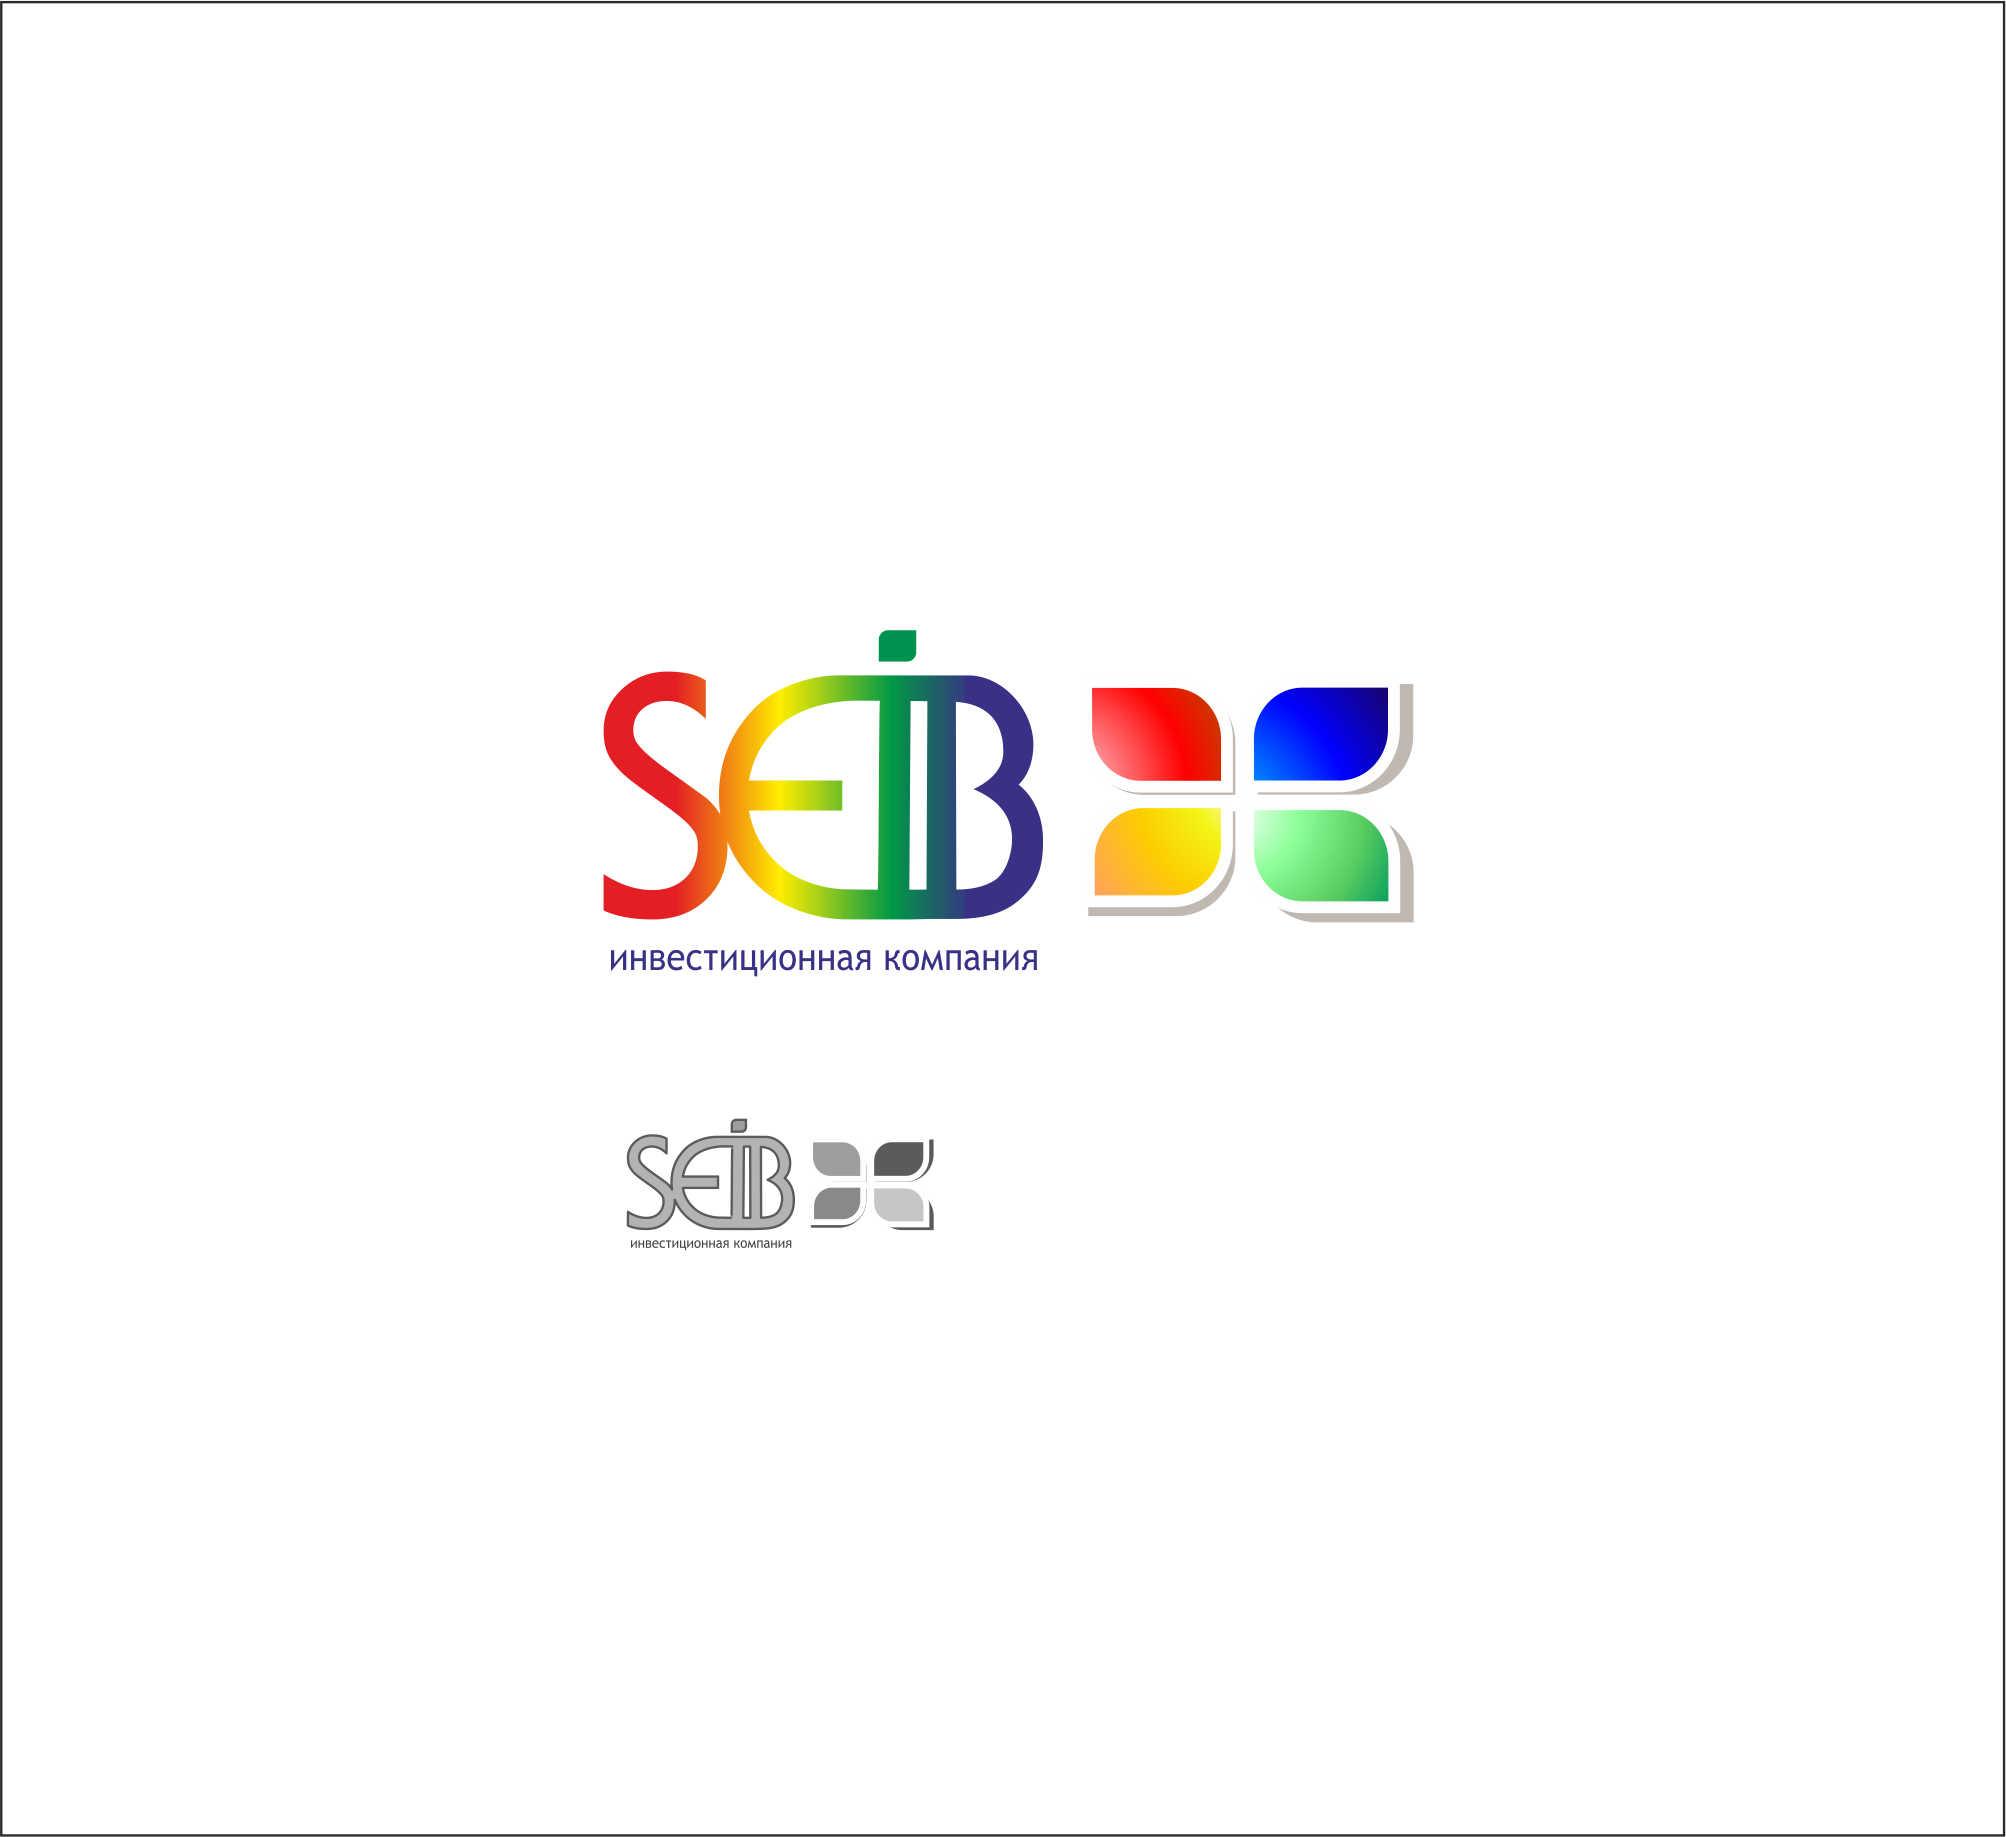 Логотип для инвестиционной компании фото f_8585150b653637f2.jpg